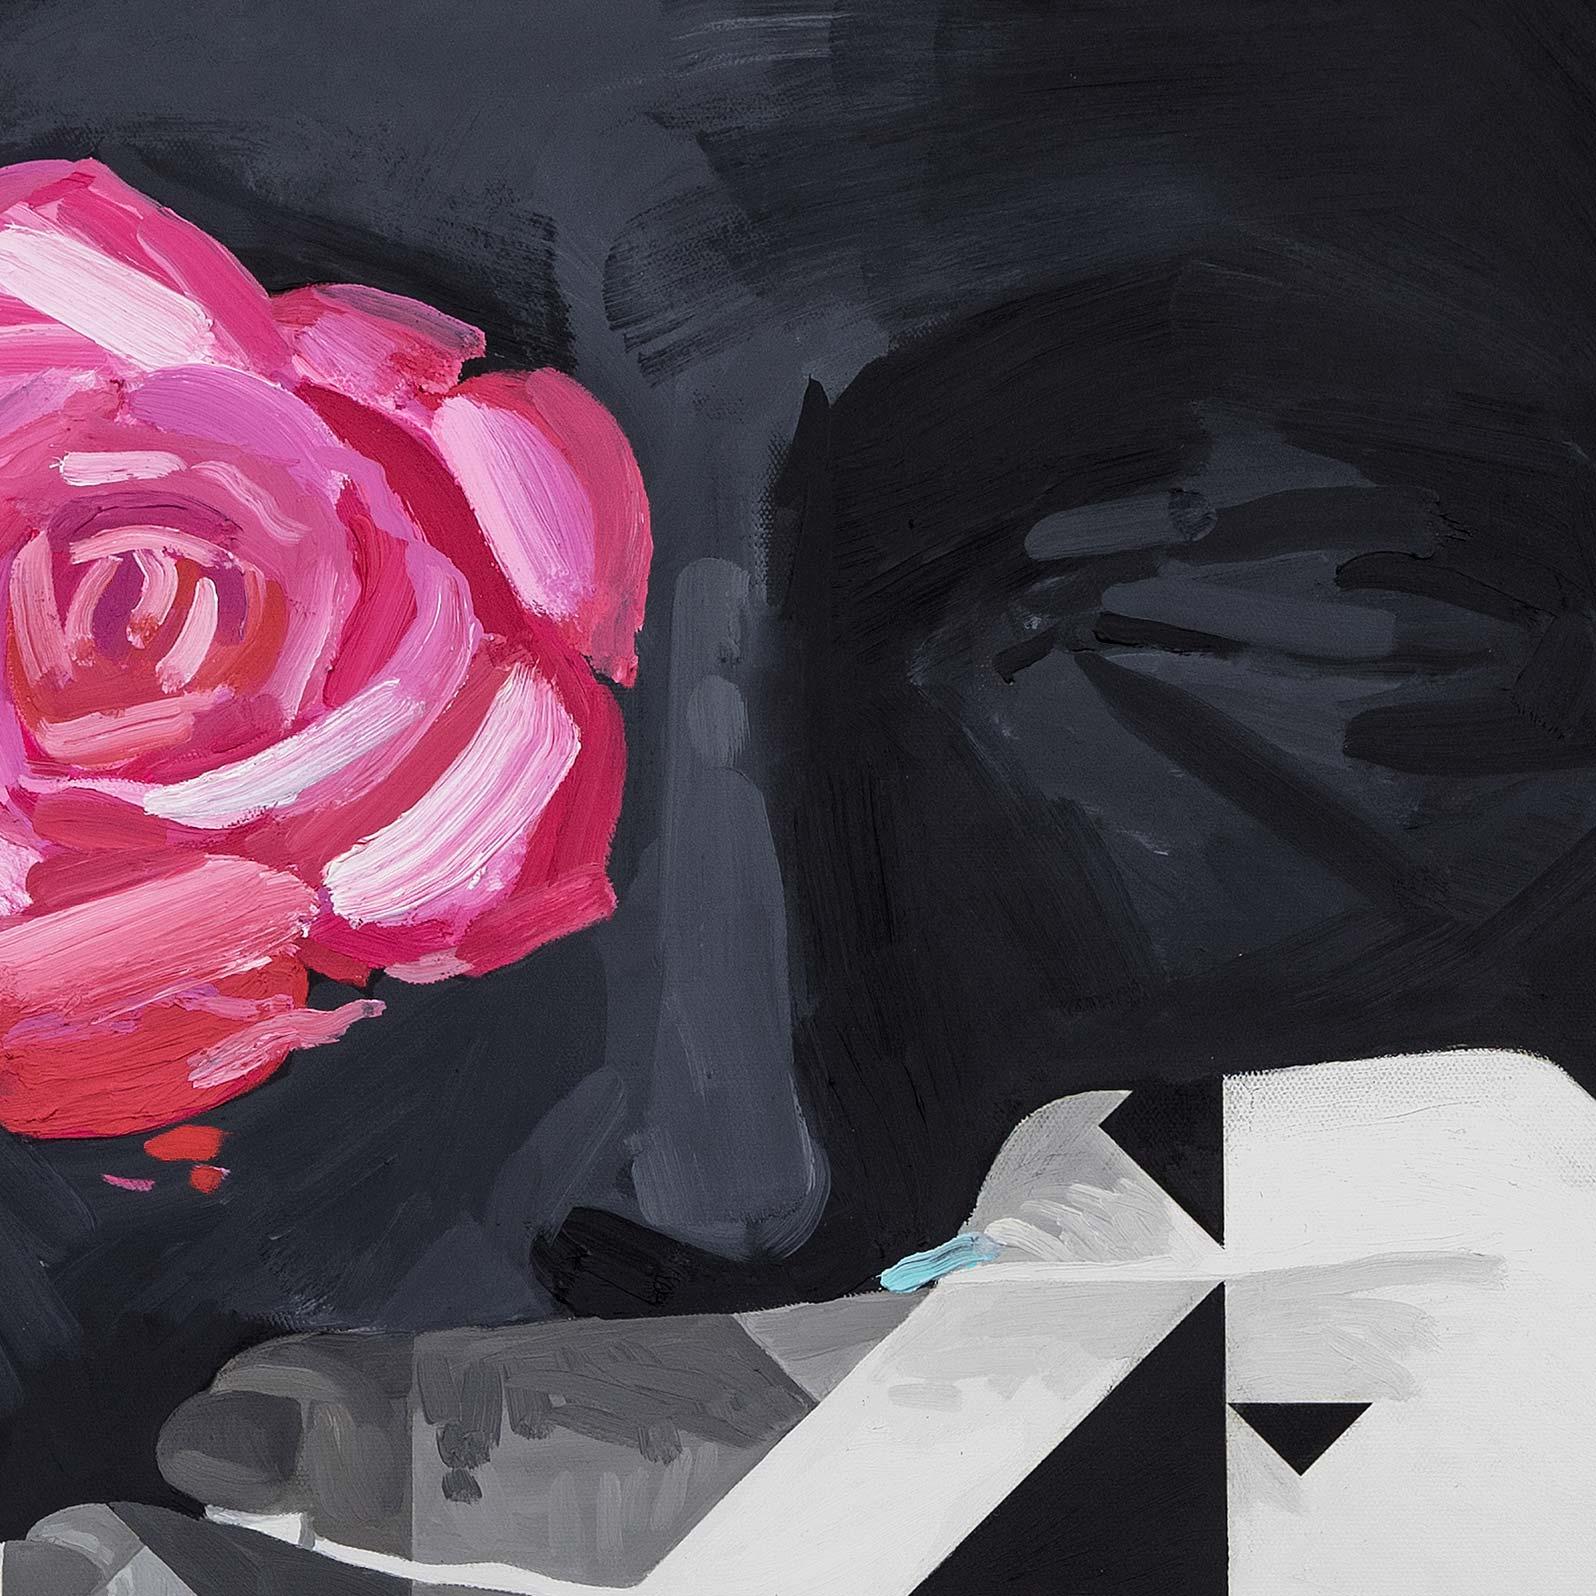 Anca Stefanescu | Contemporary Creative Painter, ASilentFragment